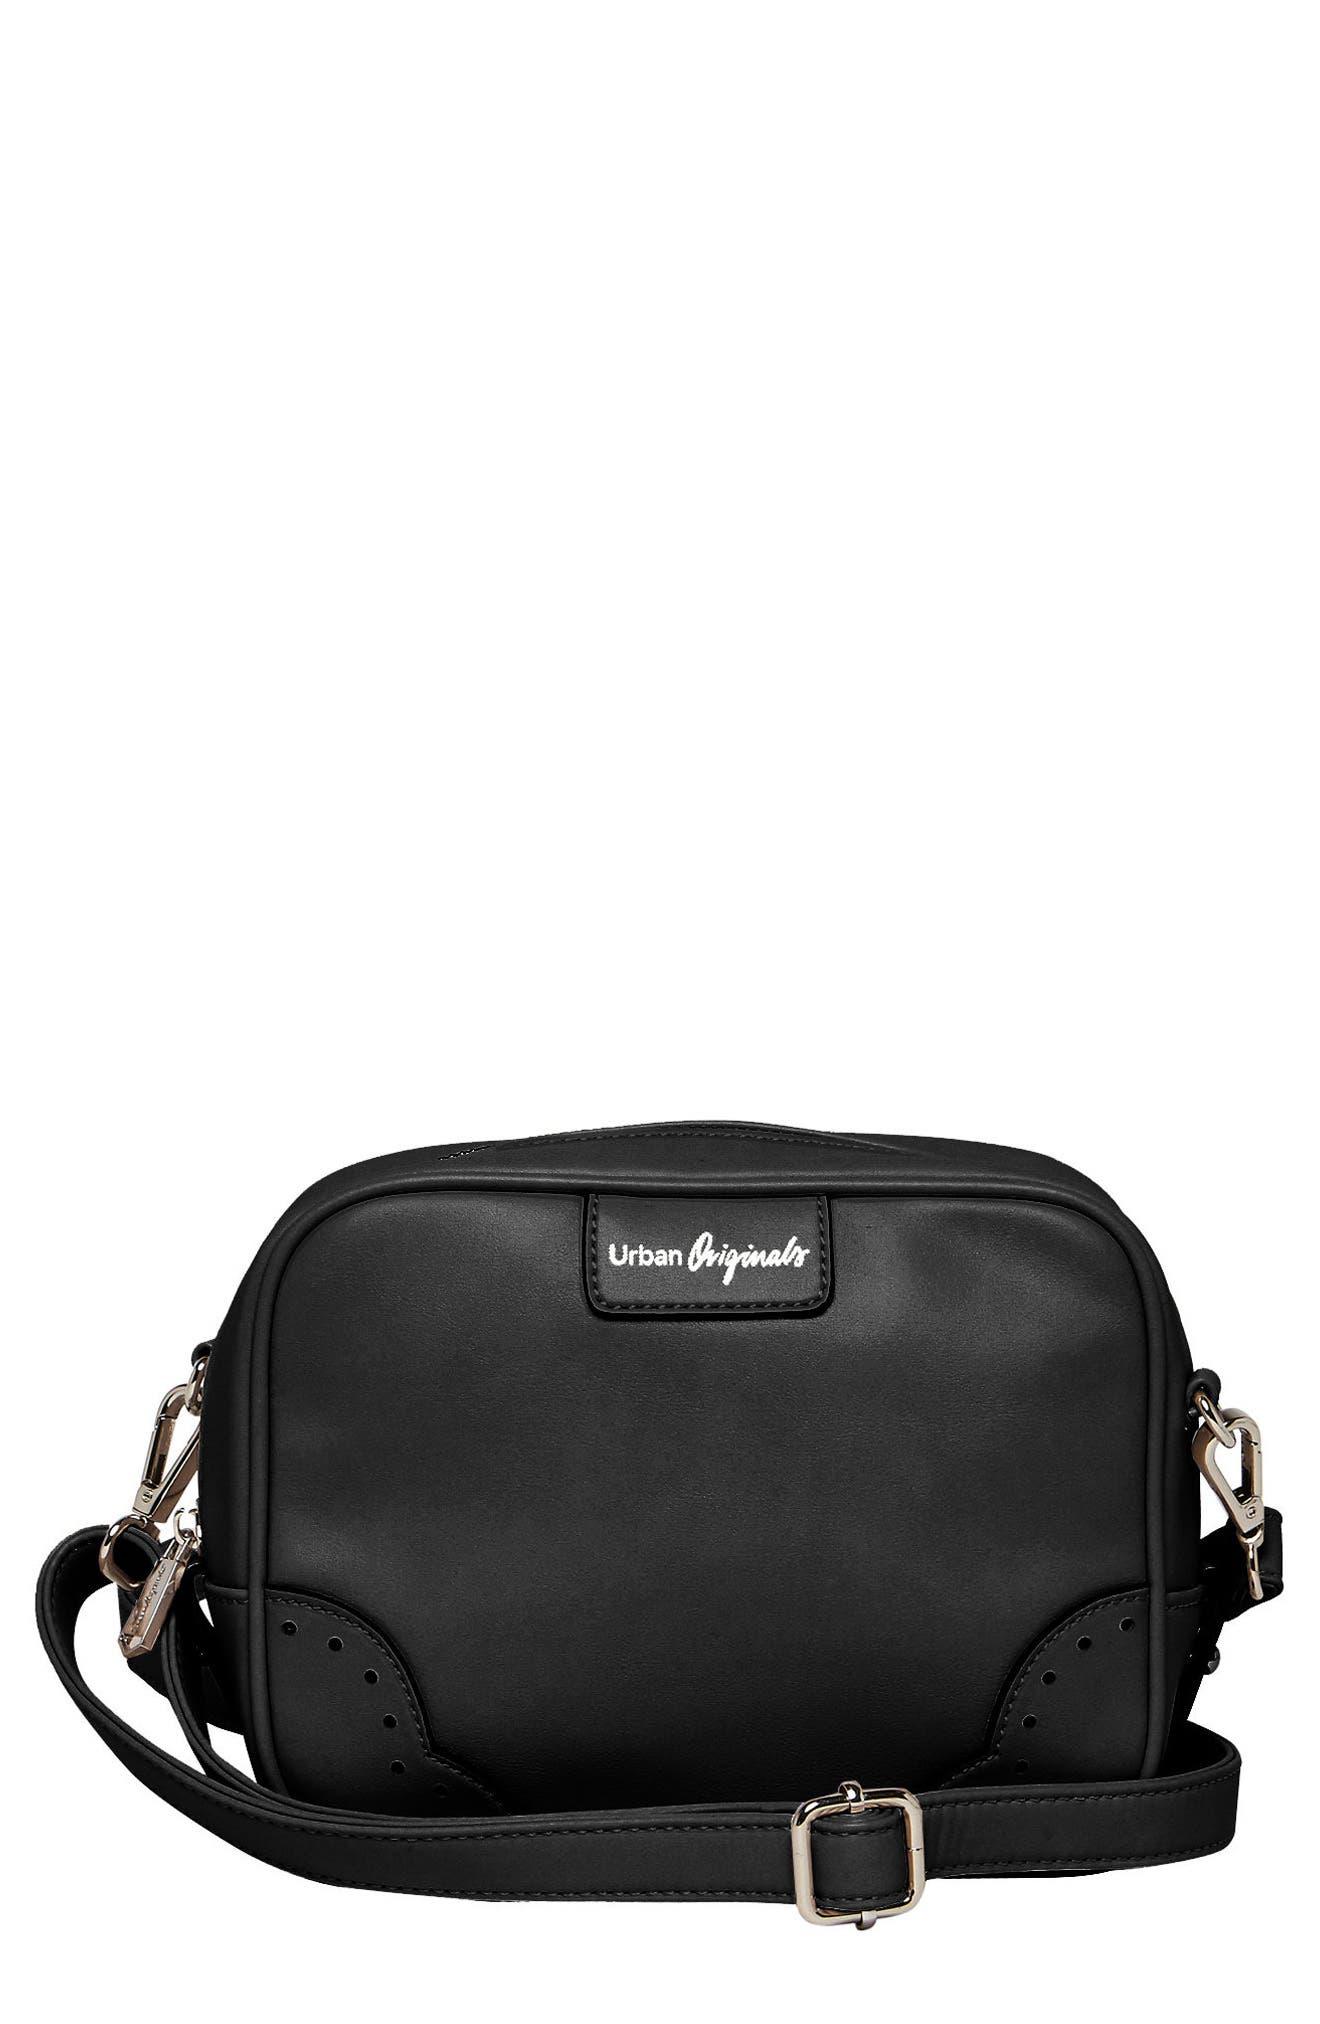 Splendour Vegan Leather Crossbody Bag,                         Main,                         color, 001